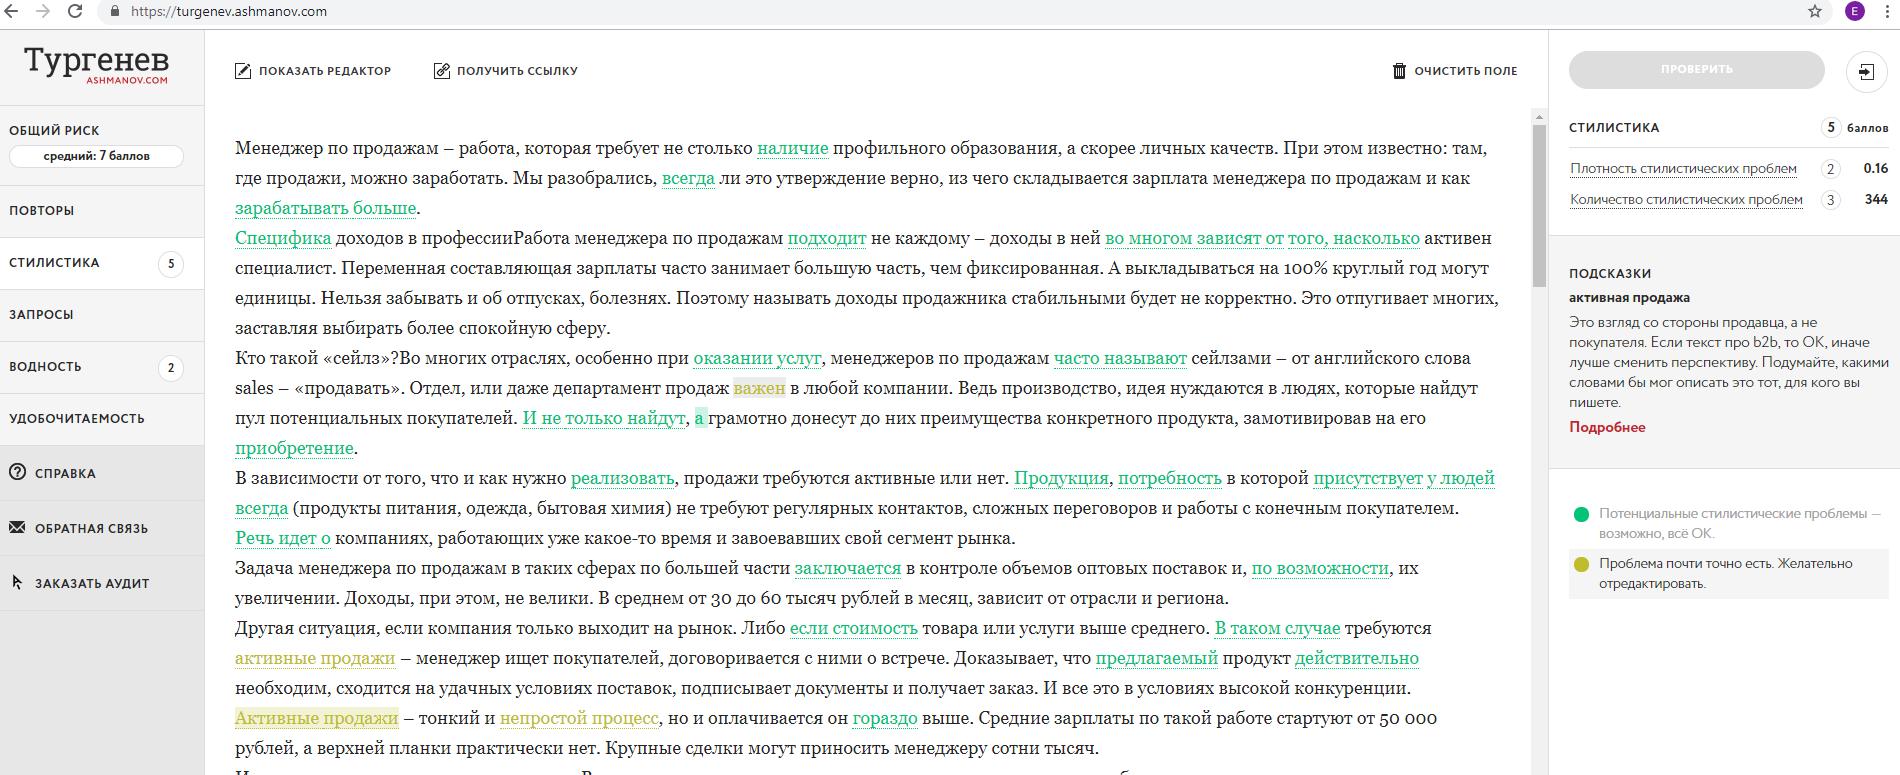 Проверка на сервисе Тургенев